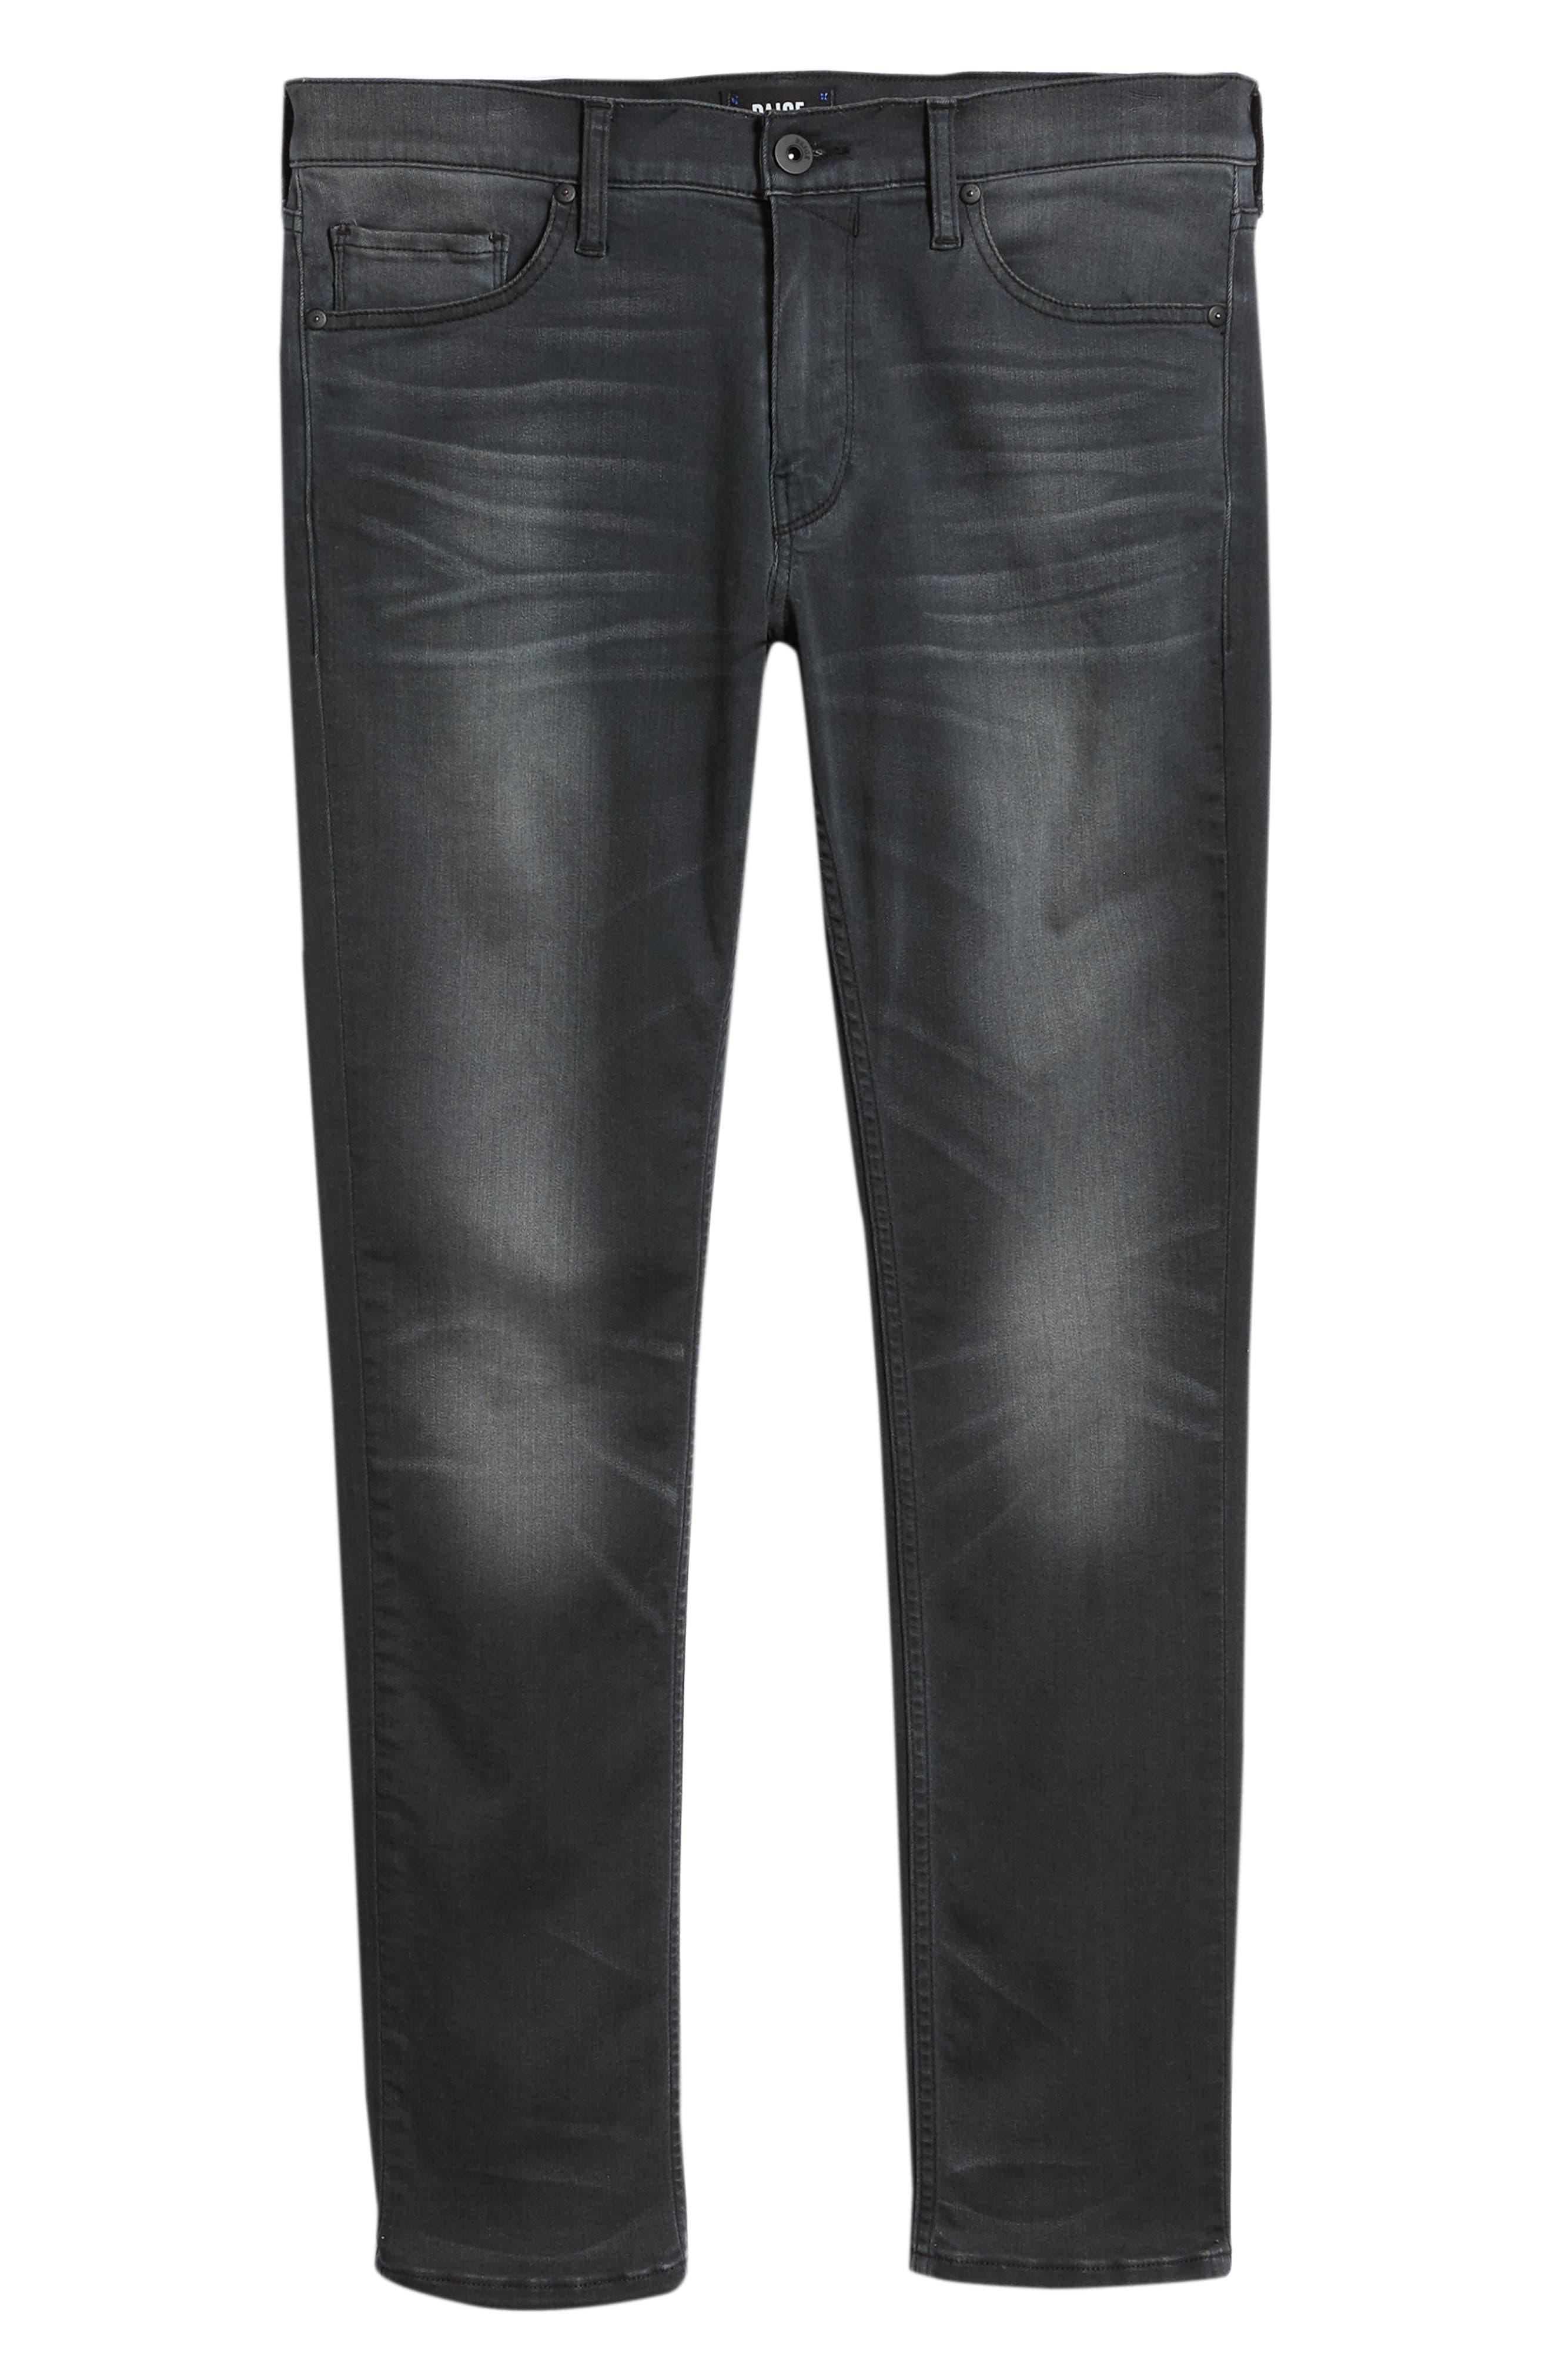 Transcend - Normandie Straight Leg Jeans,                             Alternate thumbnail 6, color,                             SHELDON